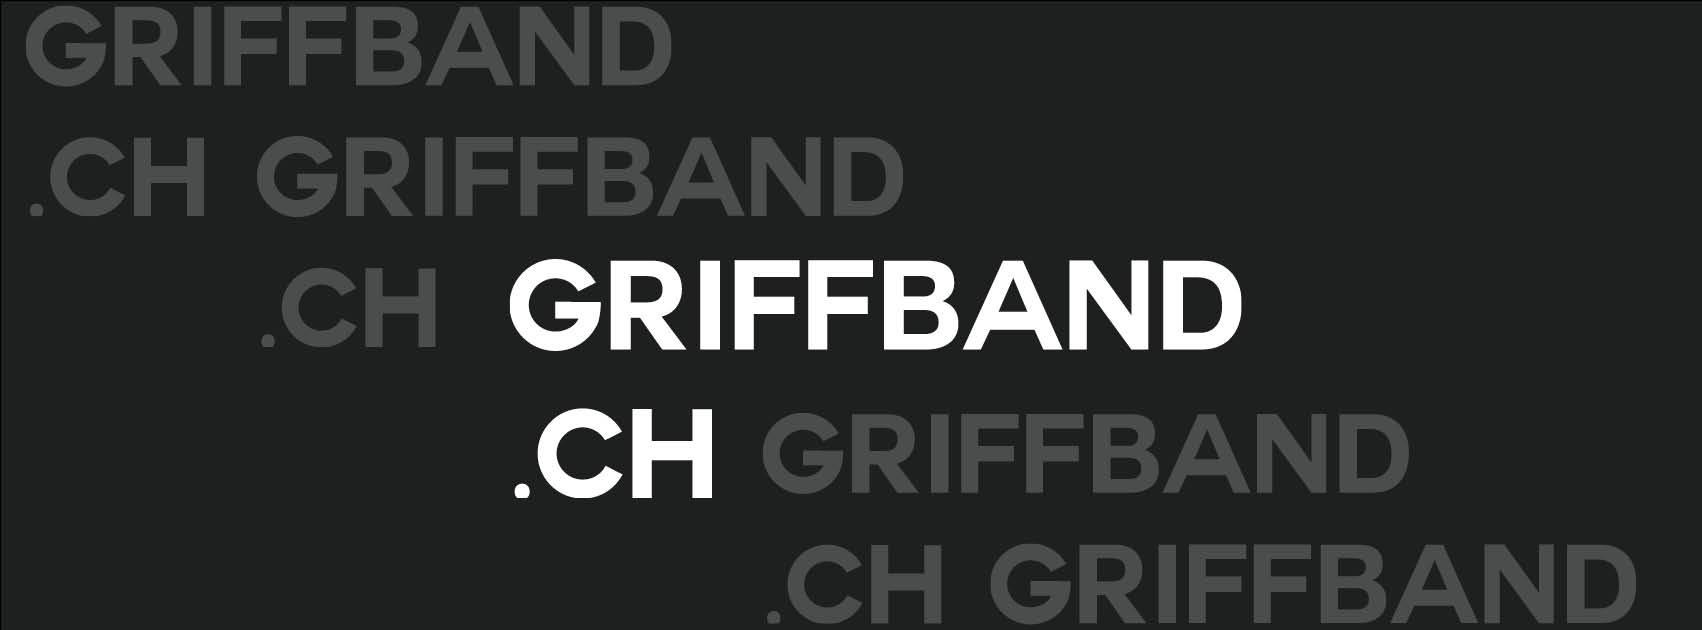 Griffband.ch.jpg